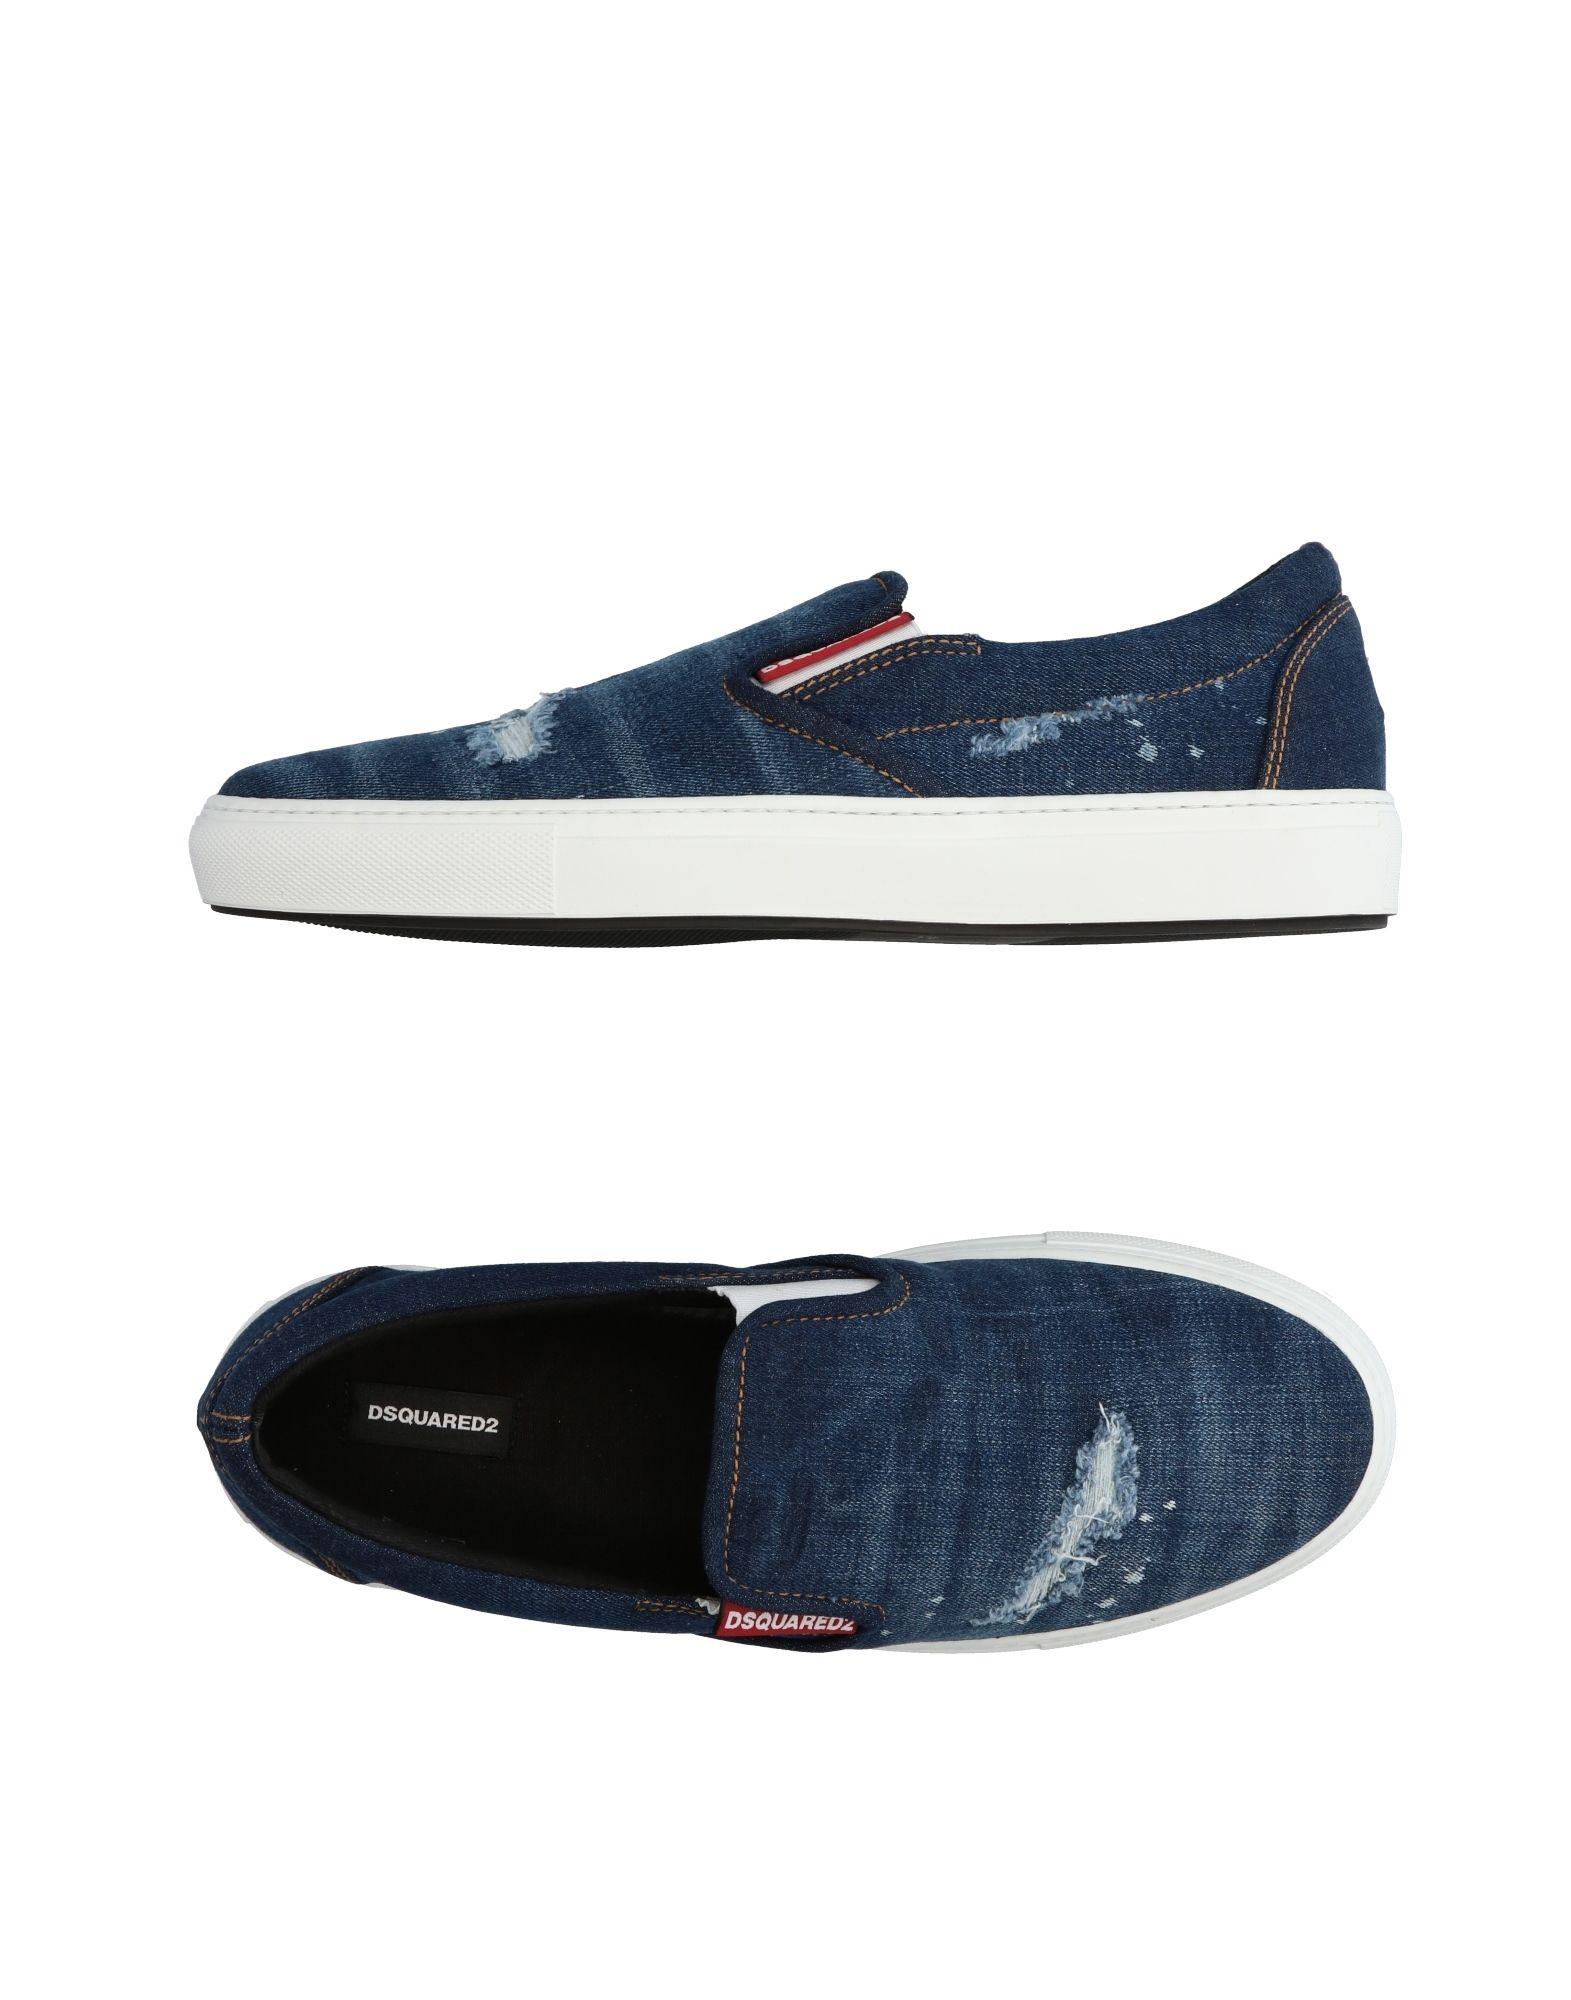 Dsquared2 Sneakers Herren  11298686DO Gute Qualität beliebte Schuhe